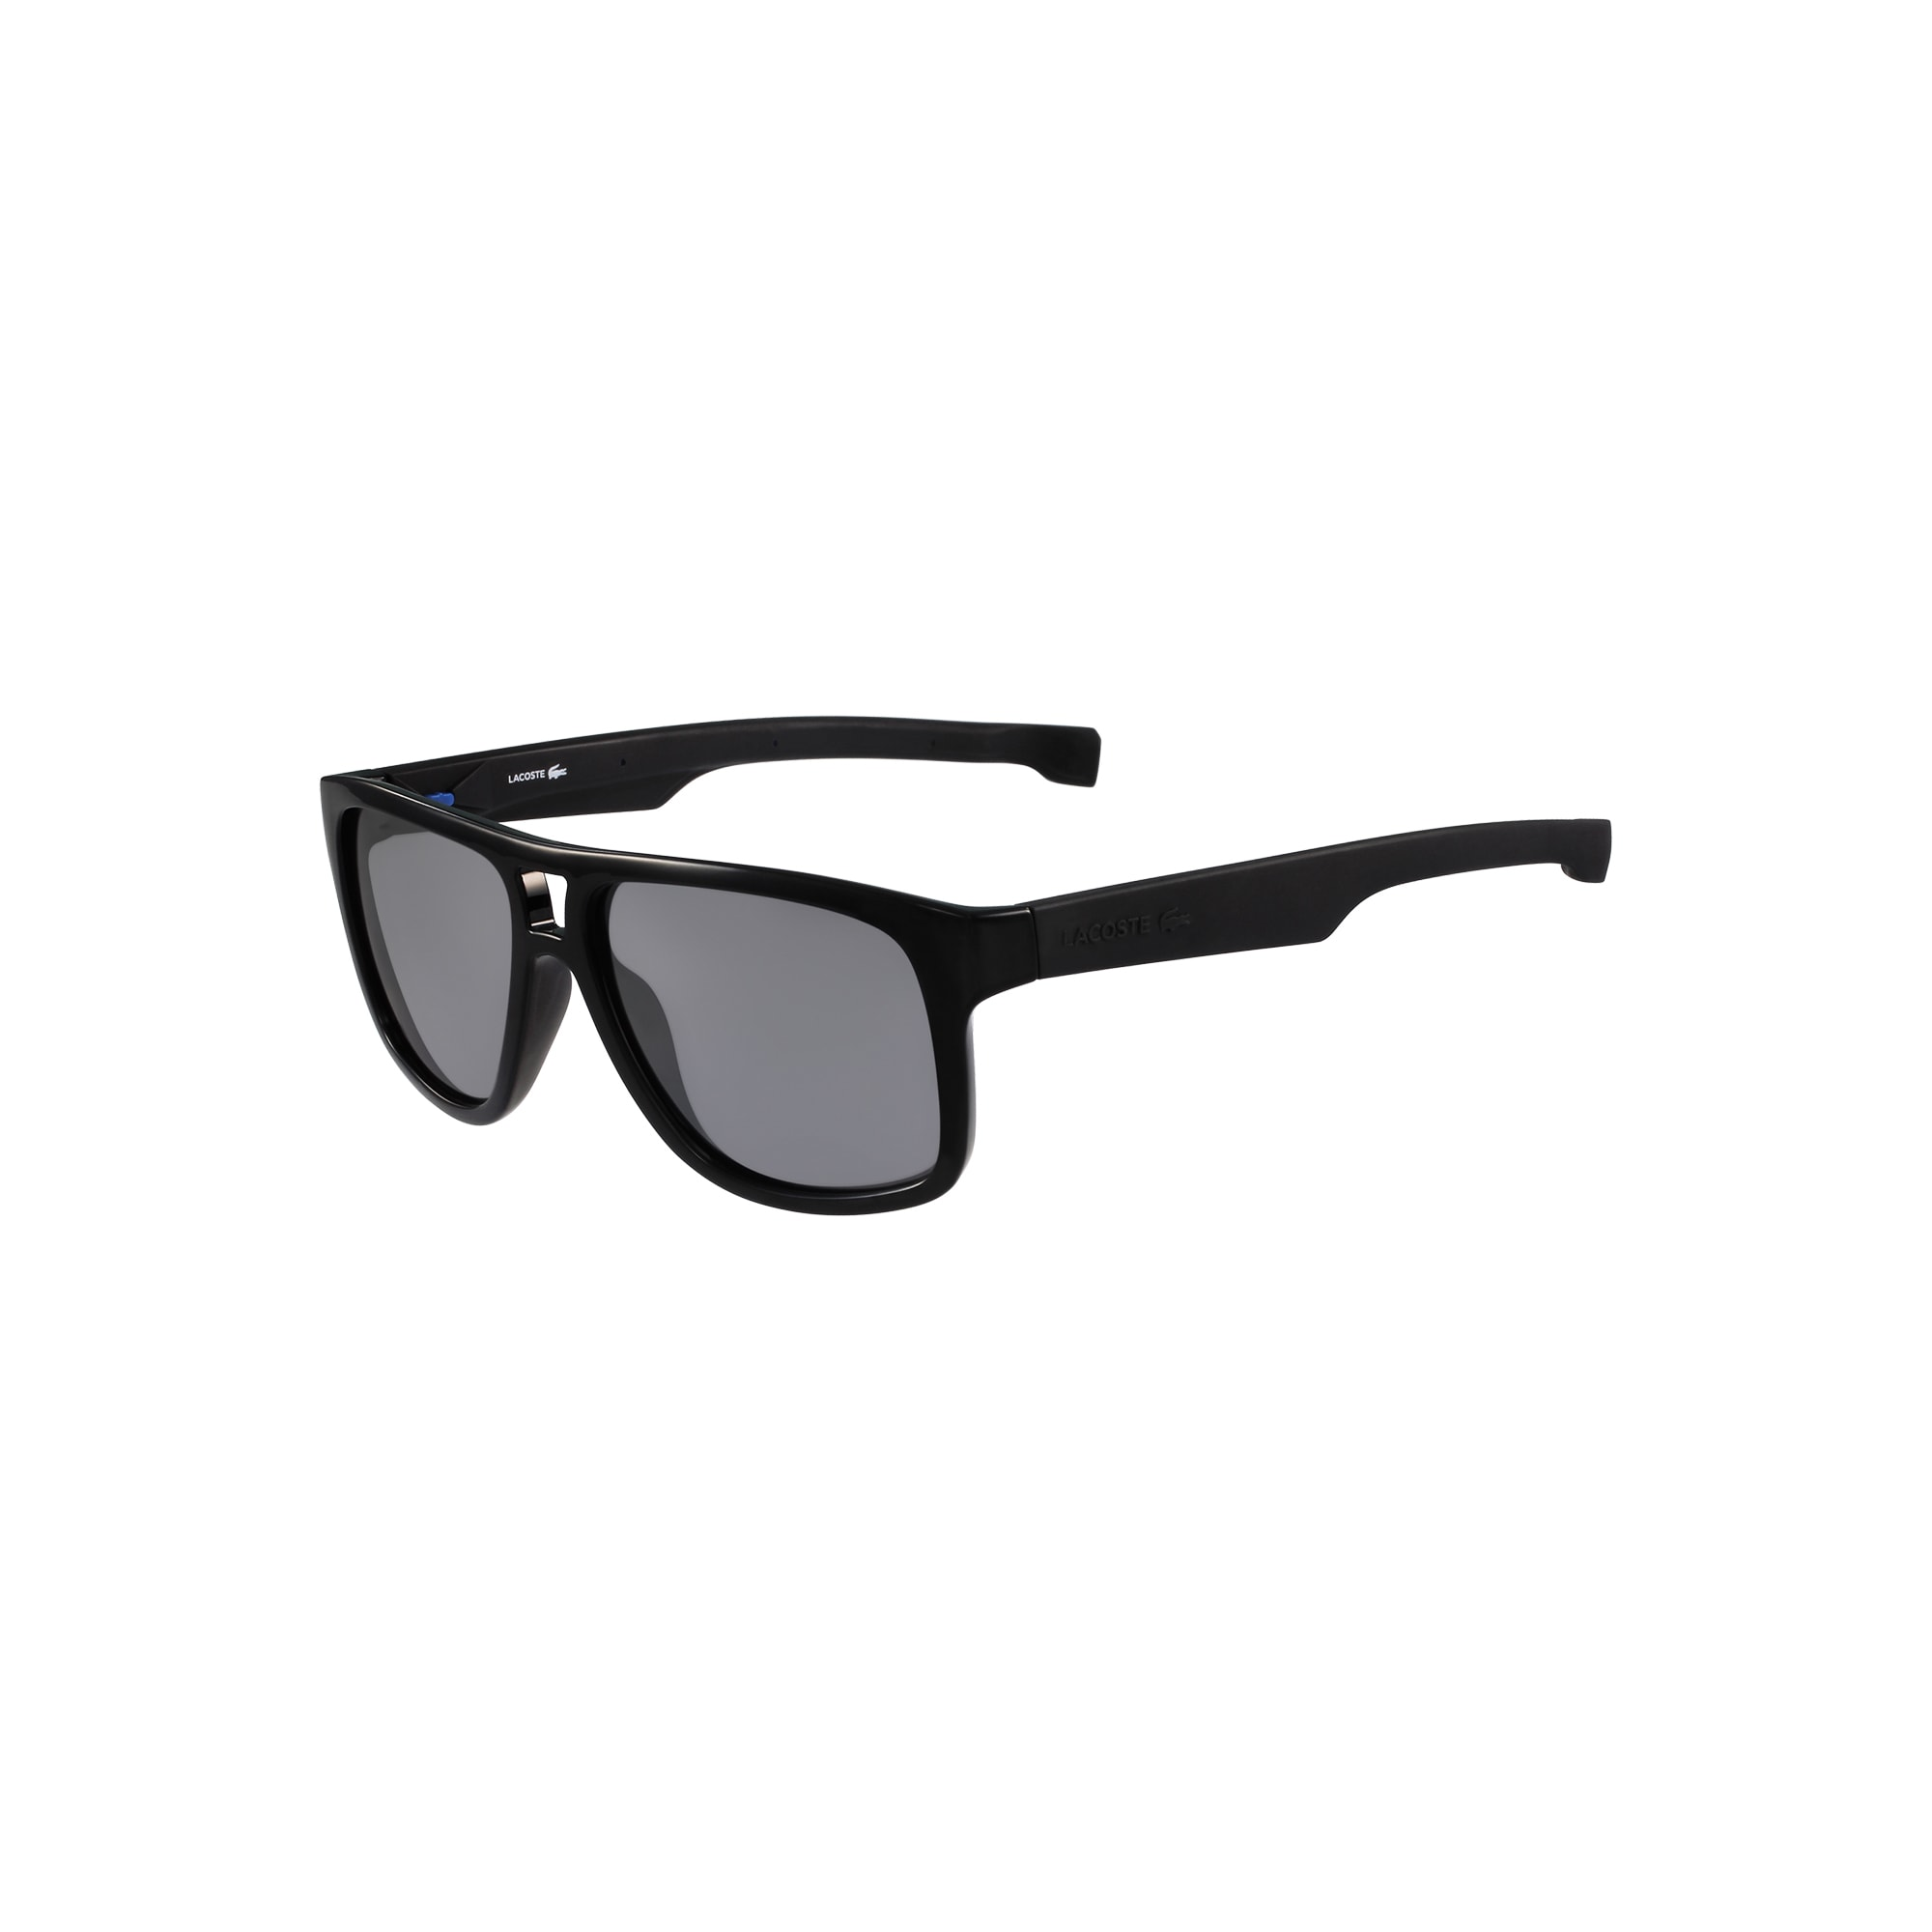 caee337dcdd Sunglasses Magnetic Frame